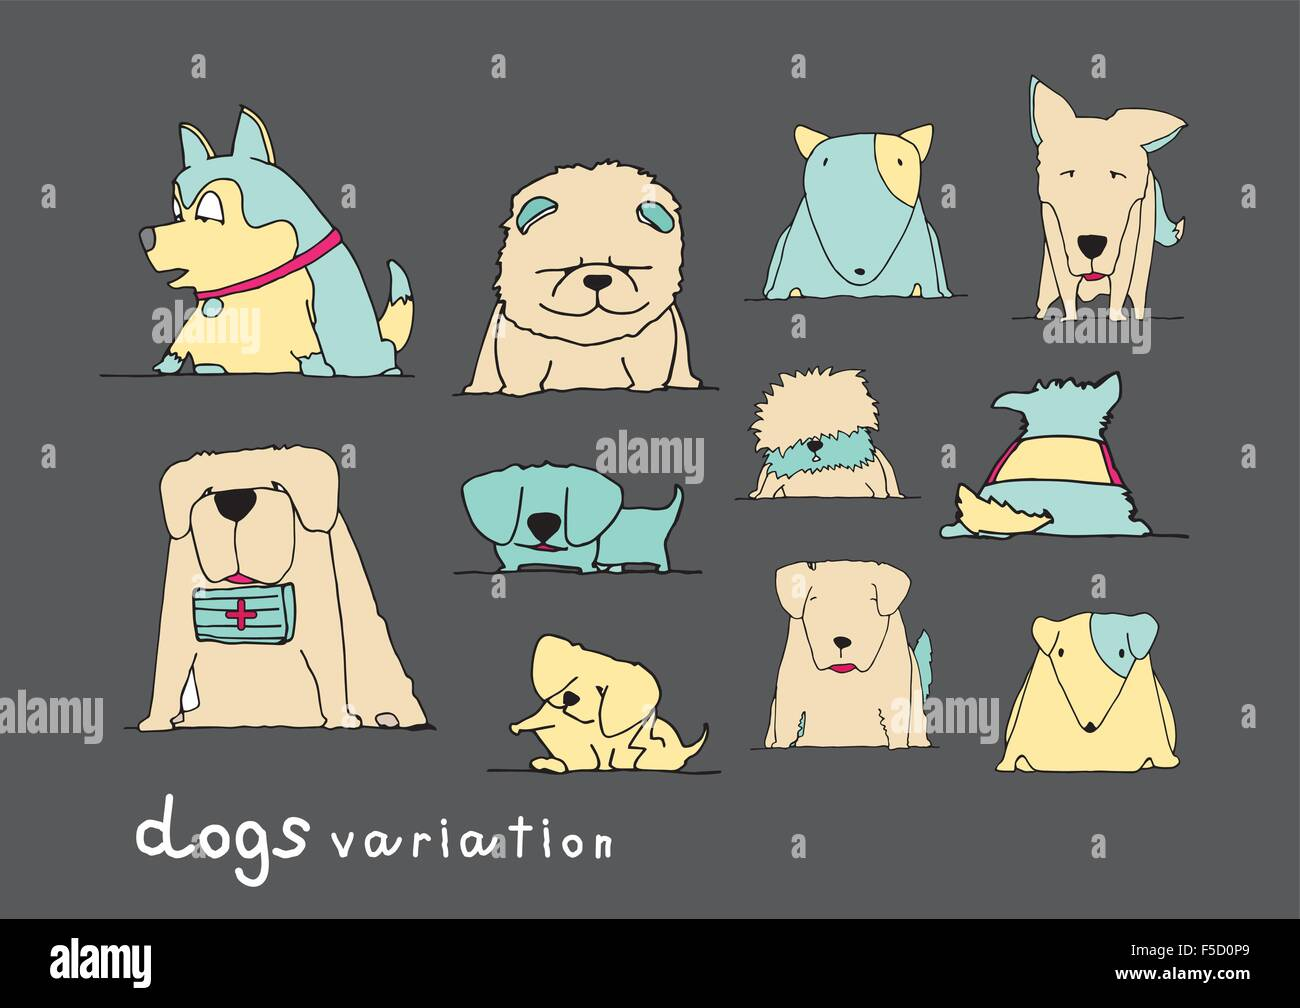 Dogs variation doodle pastel color on dark grey background - Stock Image